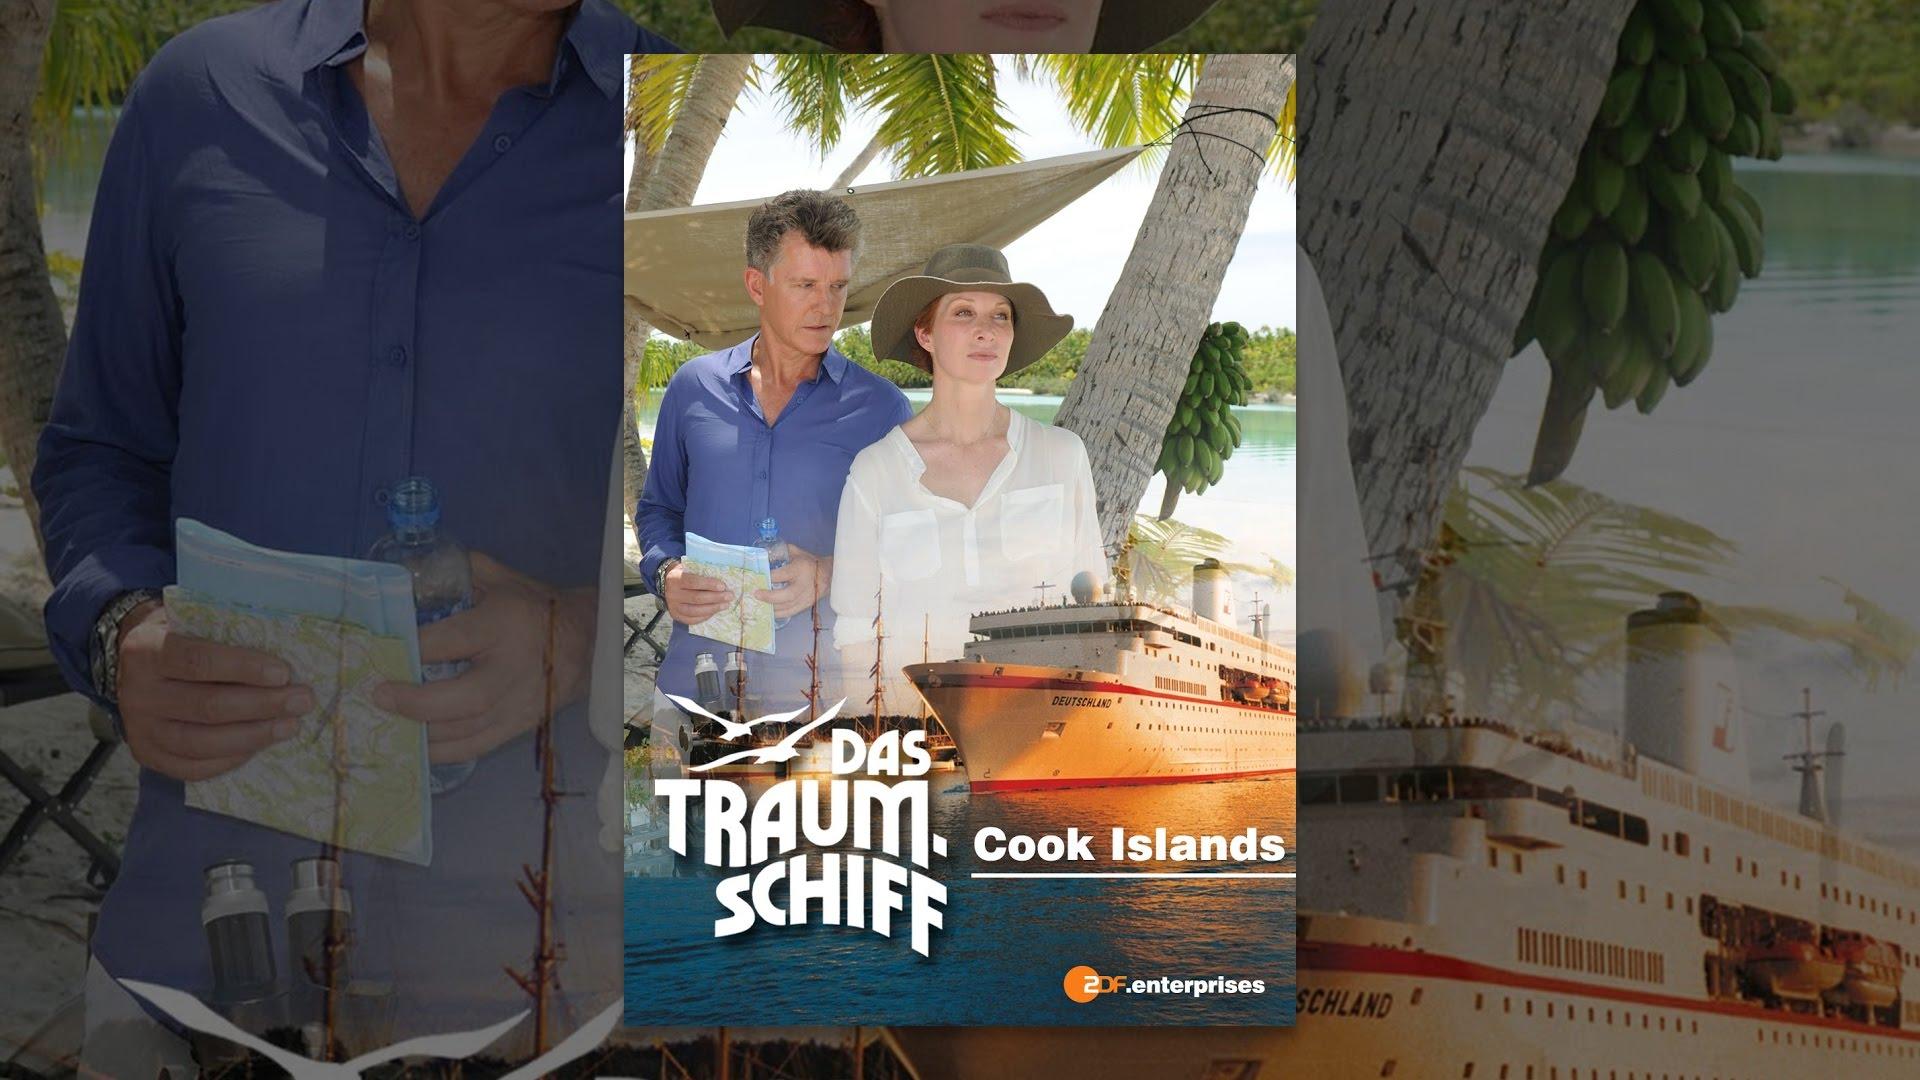 Traumschiff Cook Islands